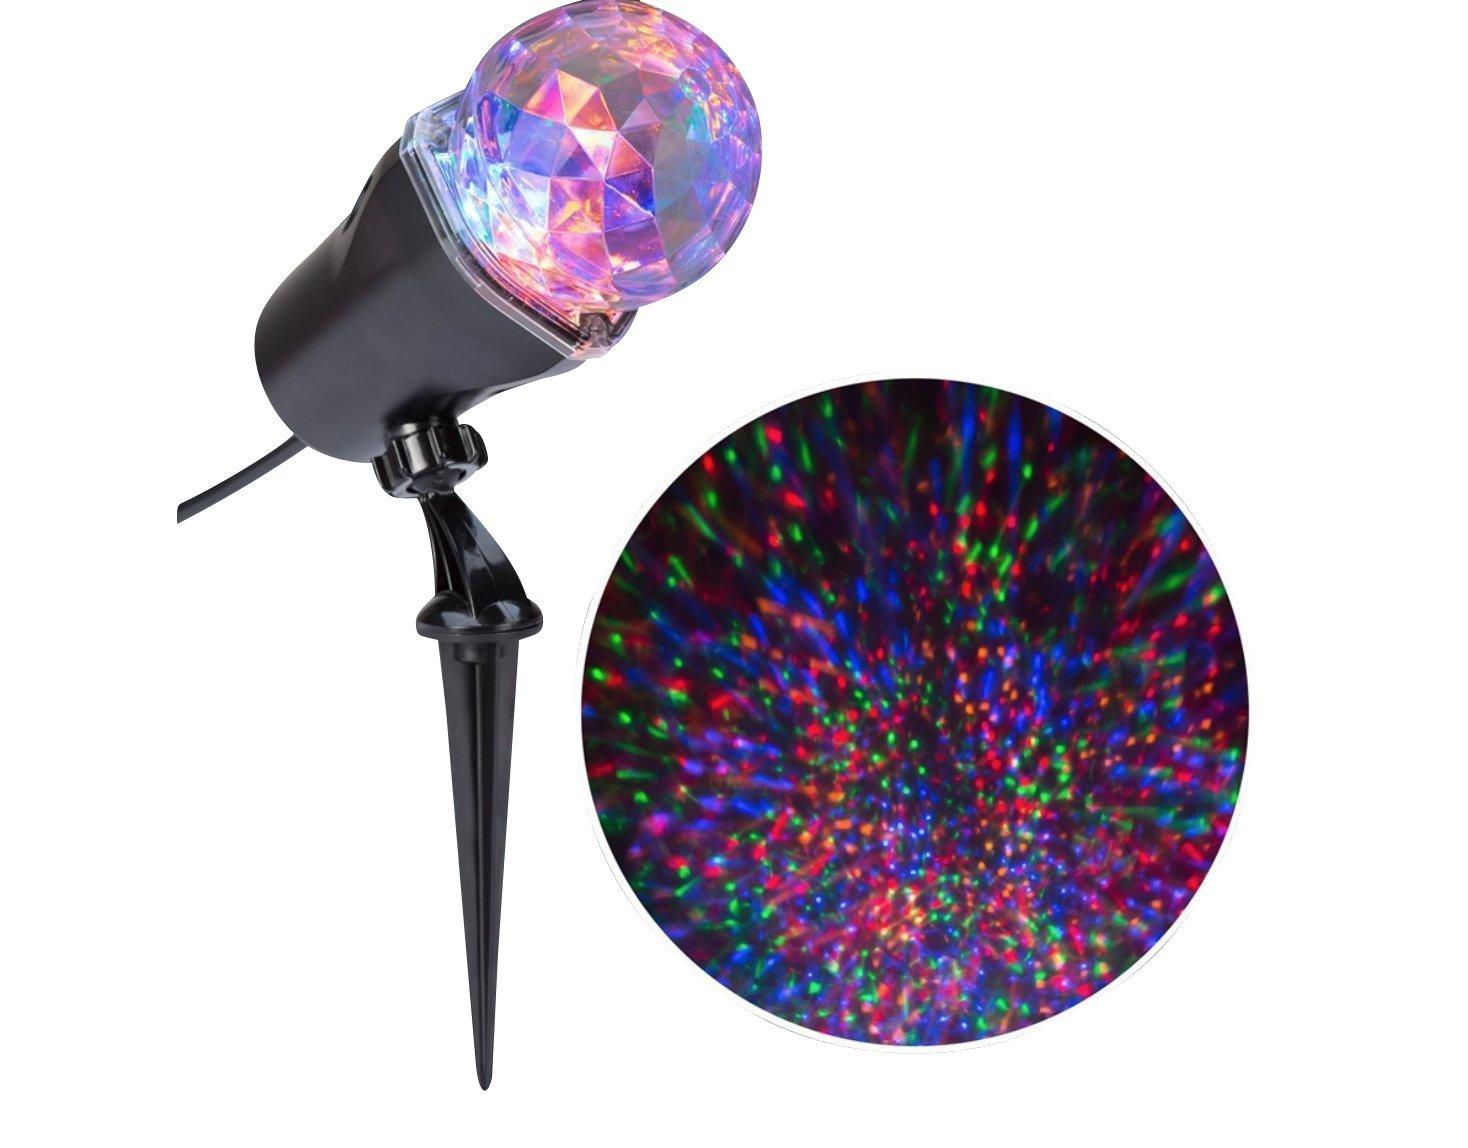 Disney Magic Holiday Enchanting LED Projection Spotlight